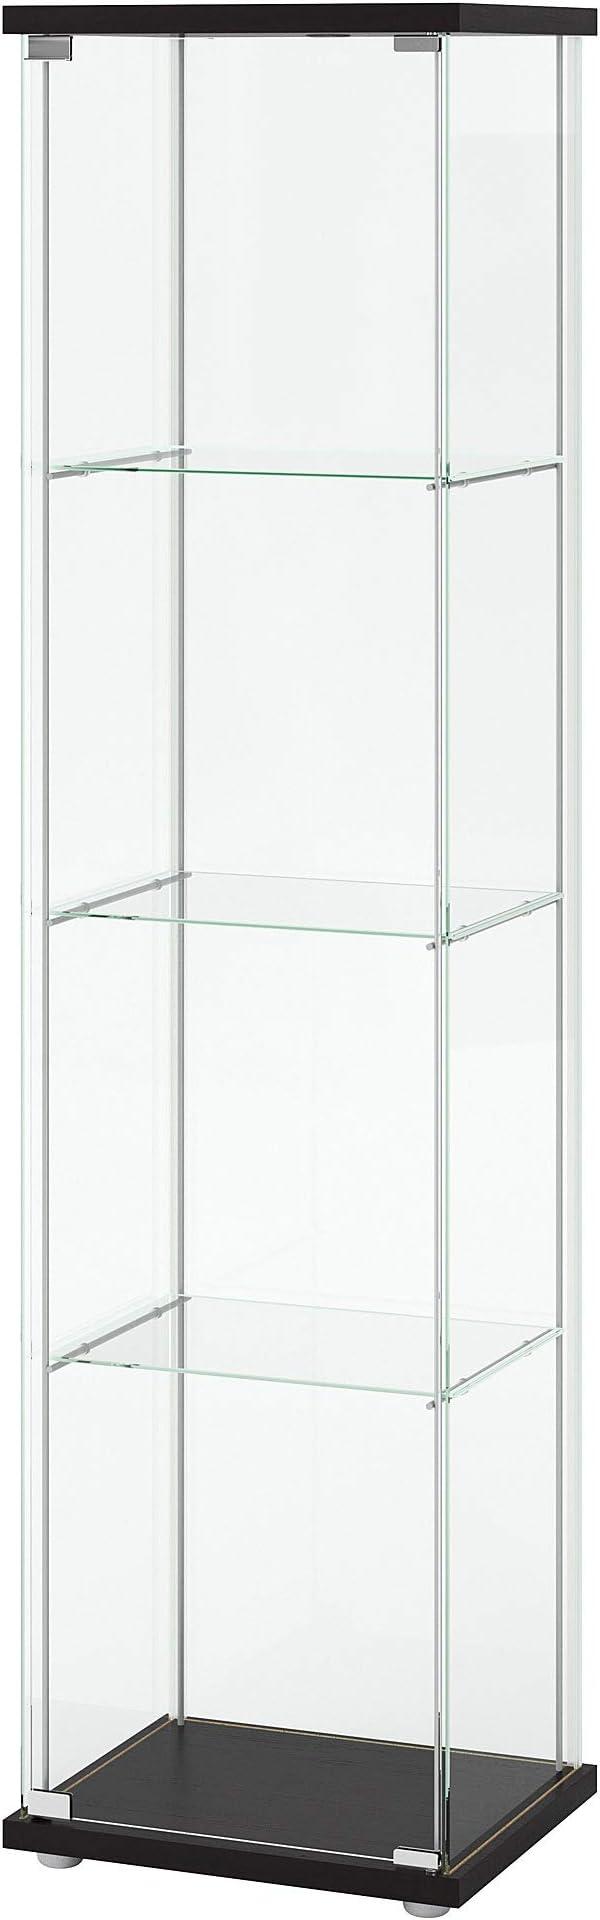 Amazon.com: IKEA Home - Armario de puerta de cristal para ...